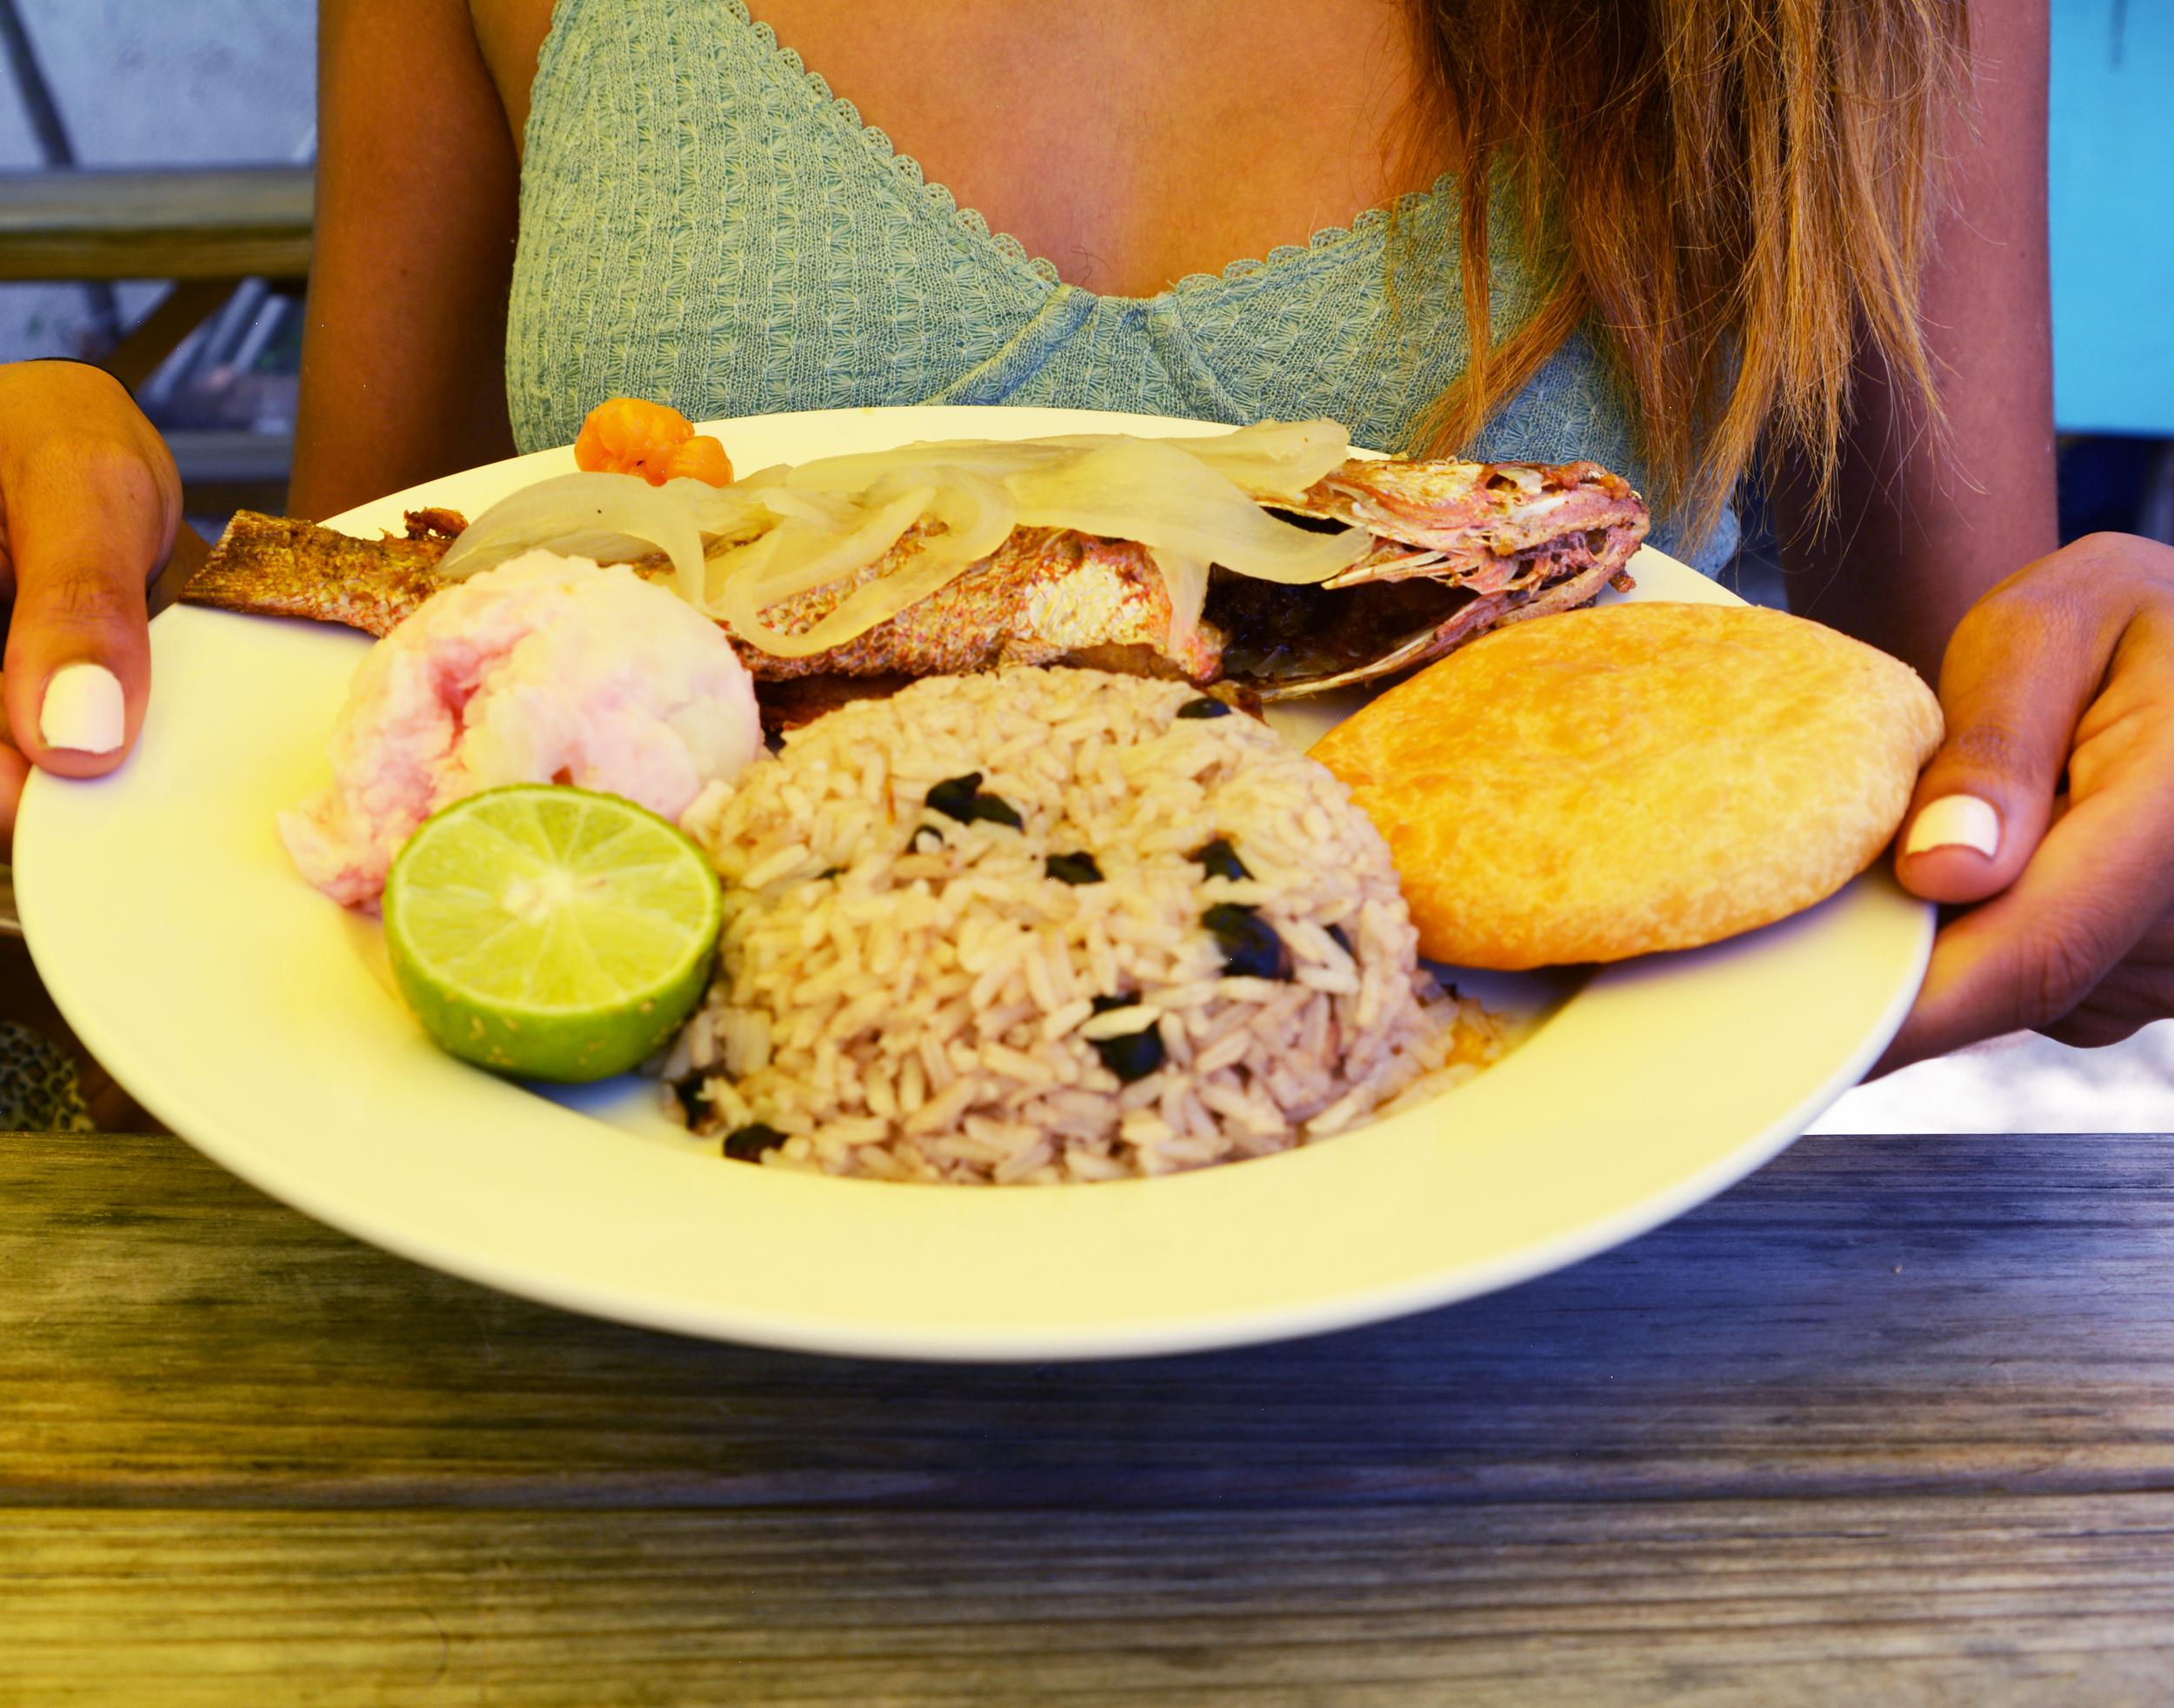 Old+Fashioned+Fish+Fry_HeritageKitchen_West_Bay-Cayman.jpg